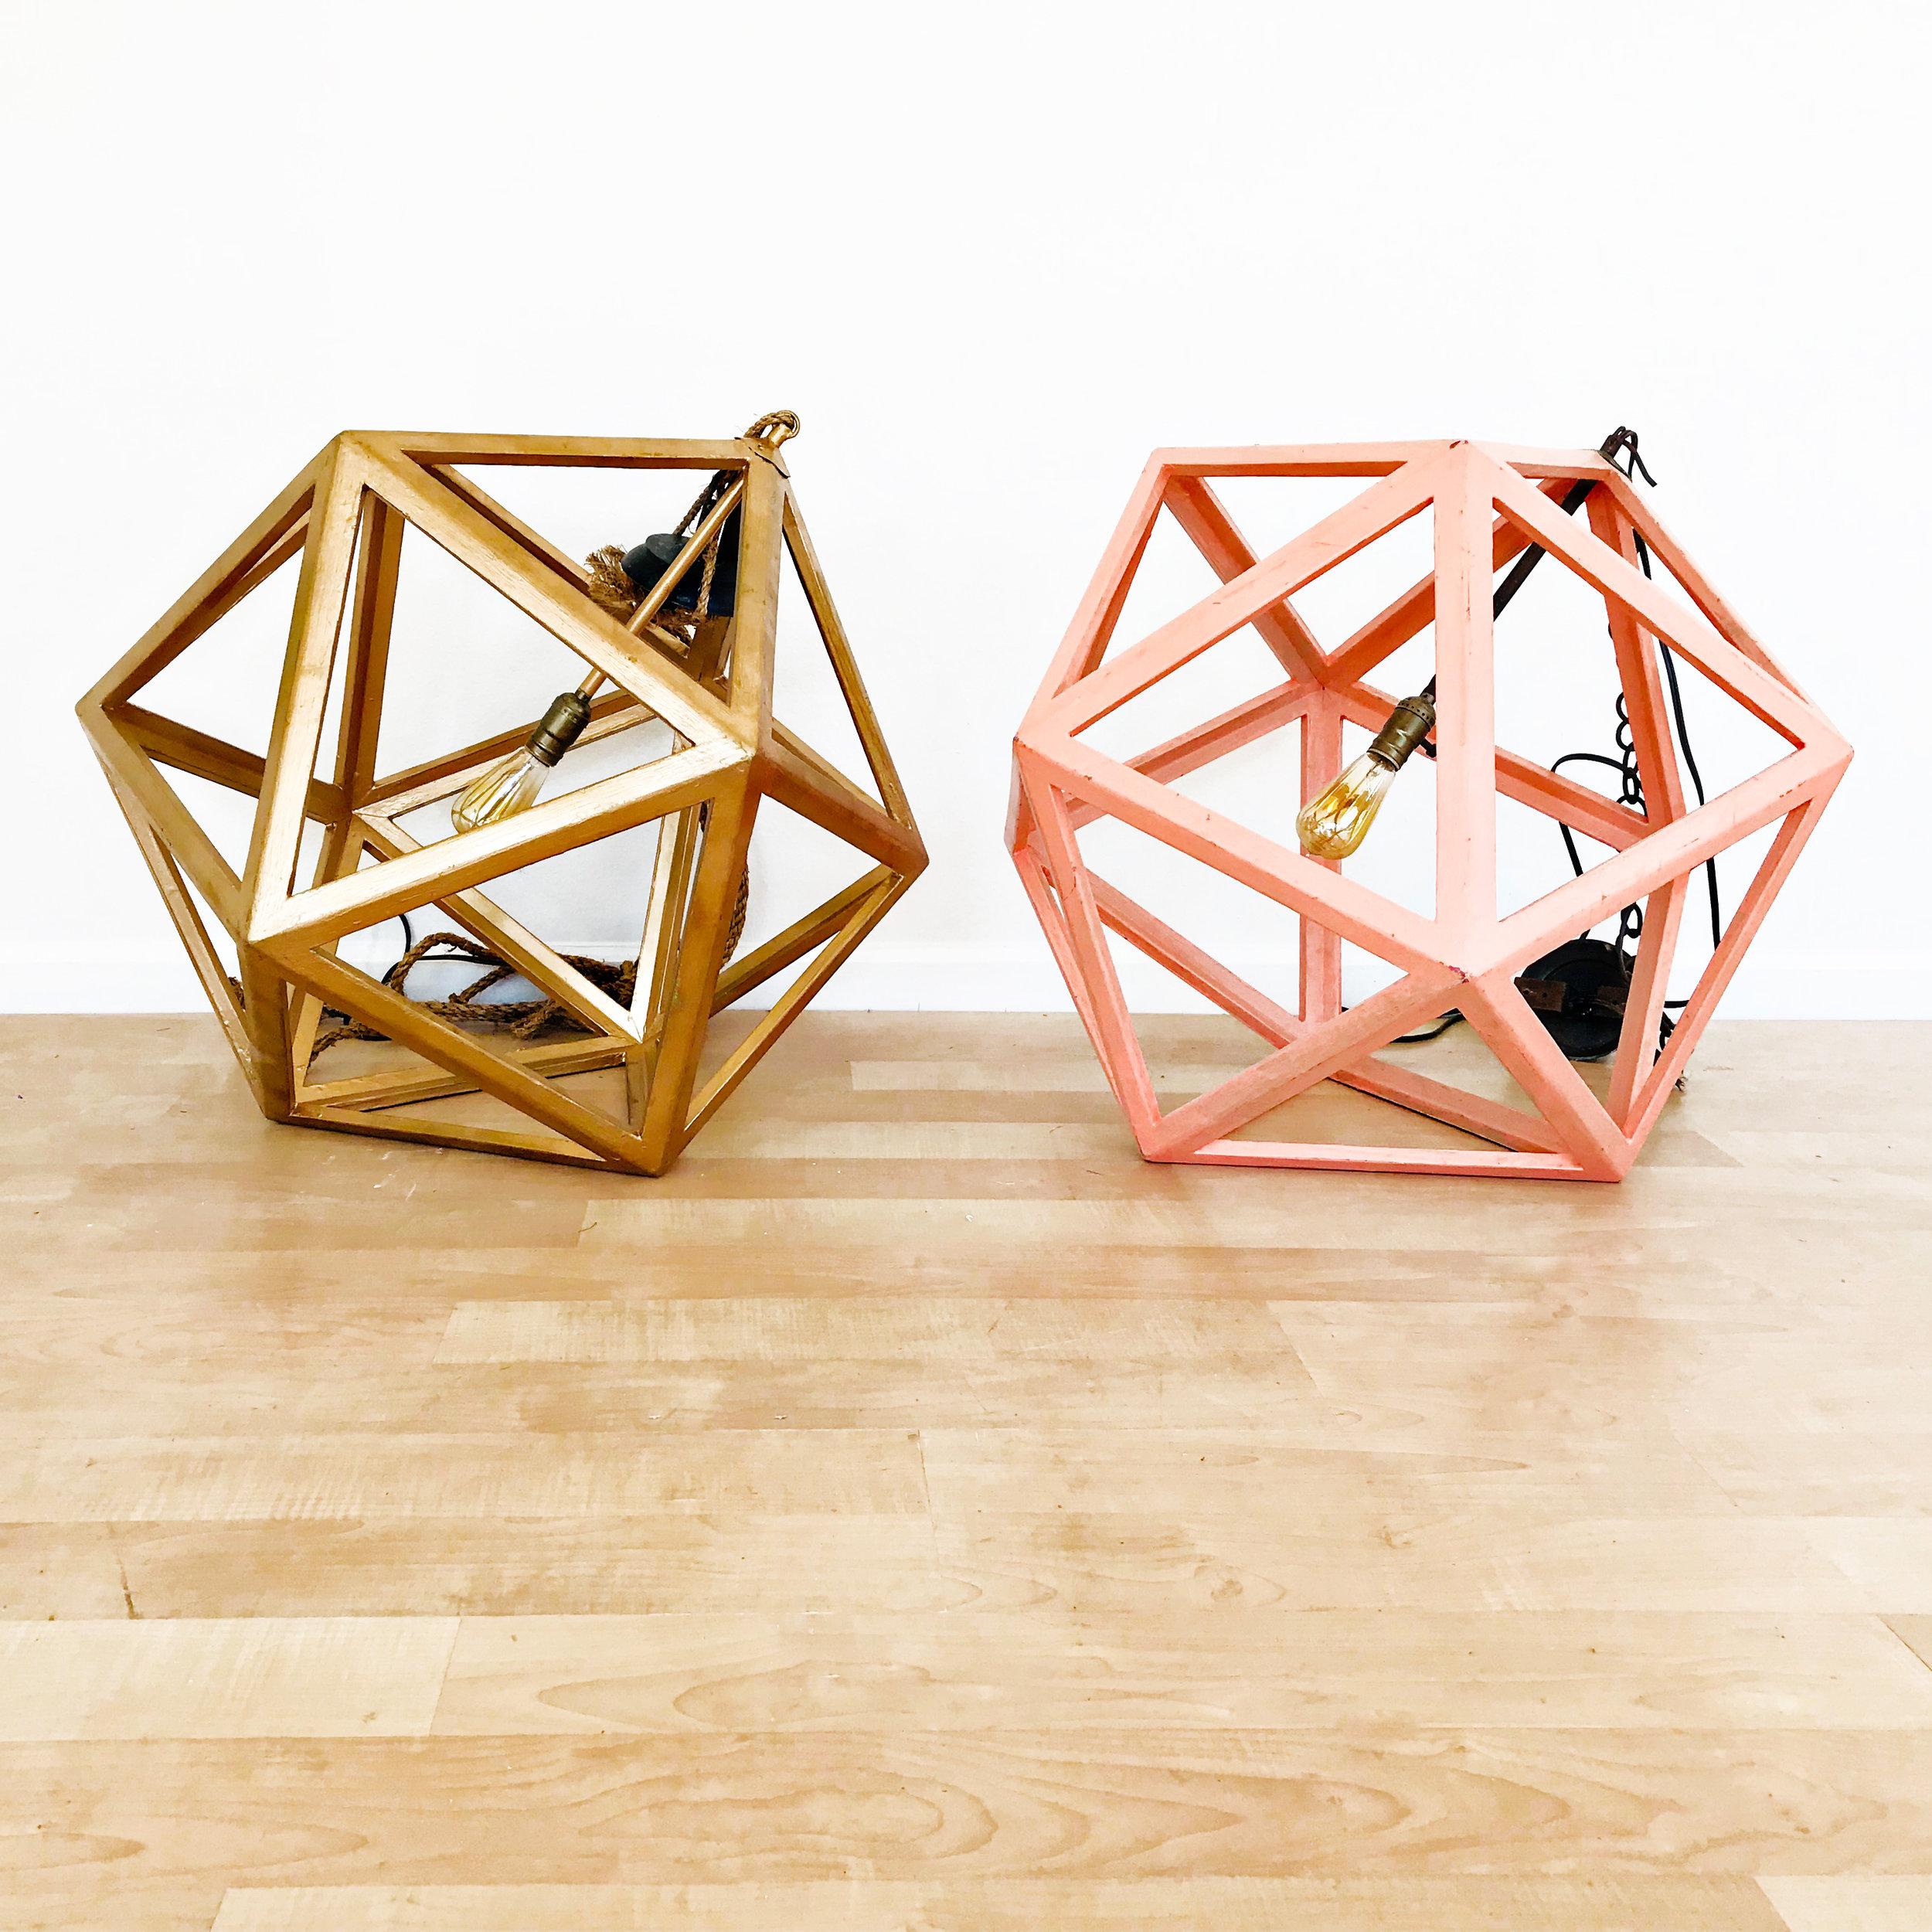 renee landry events geometric wood globe chandelier decor wedding rentals.jpg